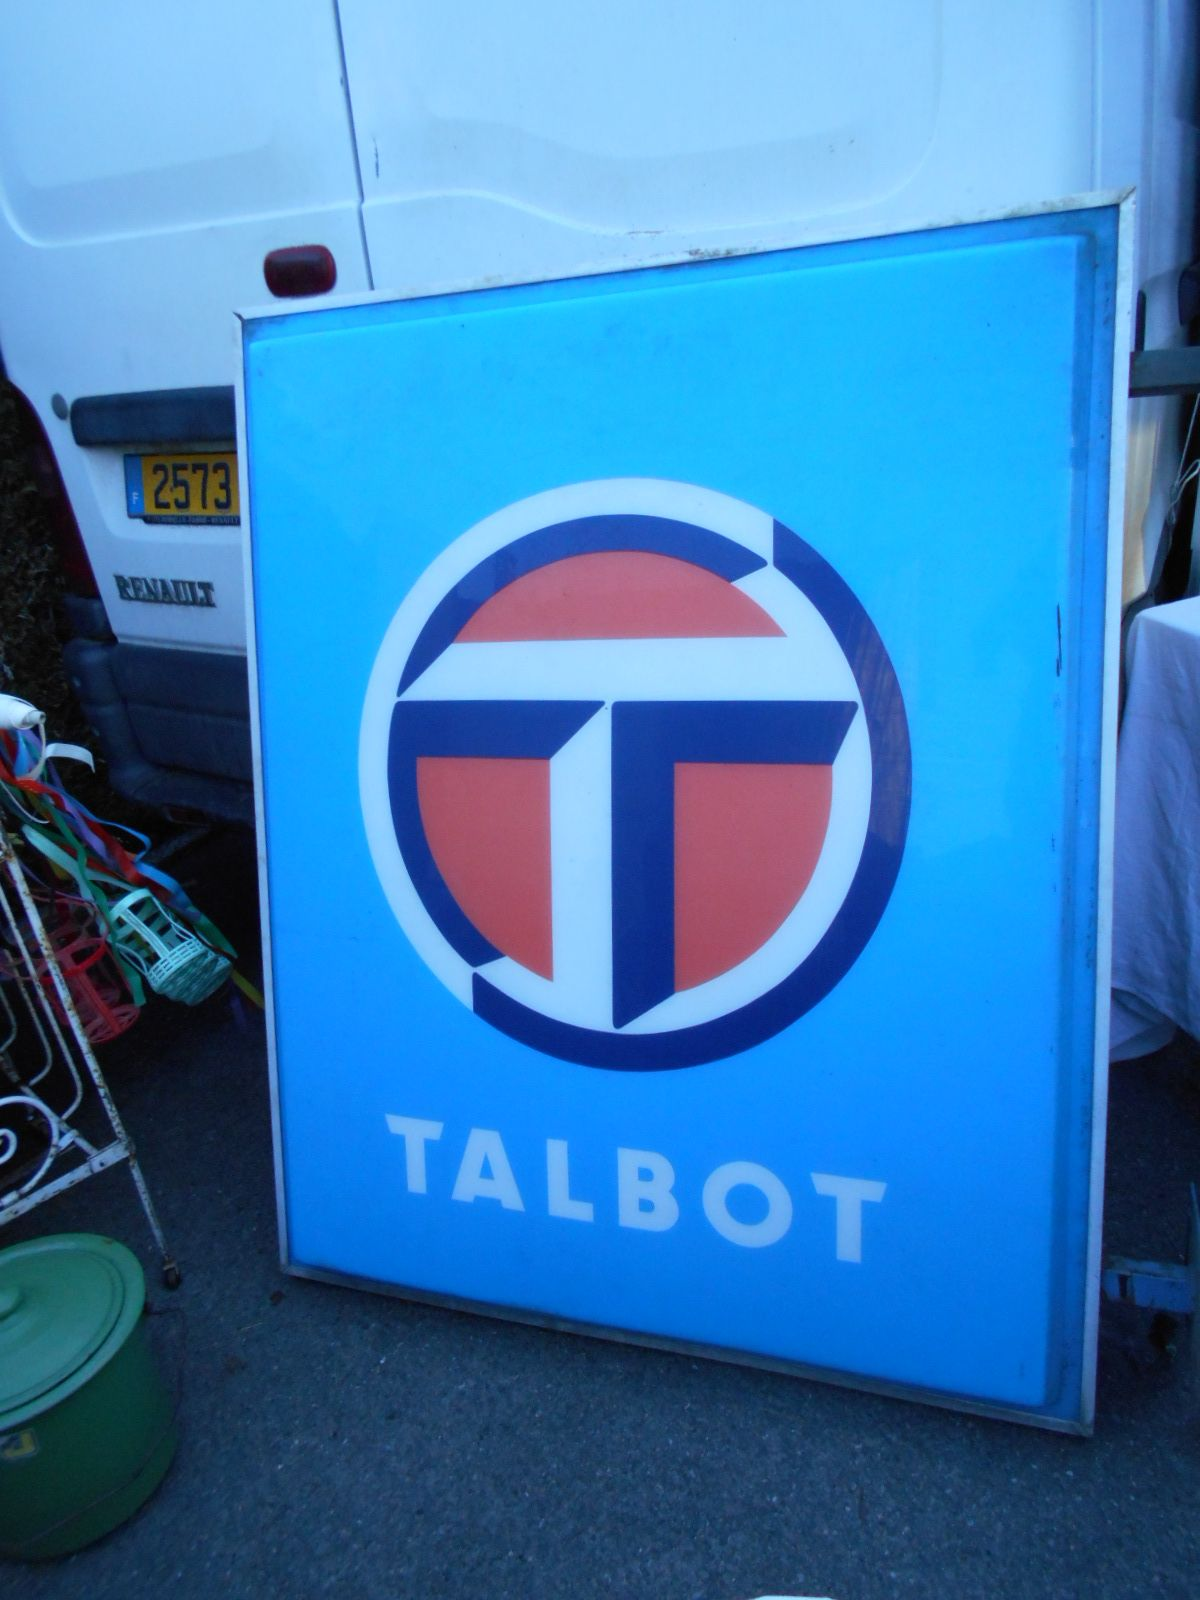 Talbot Enseigne vers 1980 Talbot Chrysler Rootes